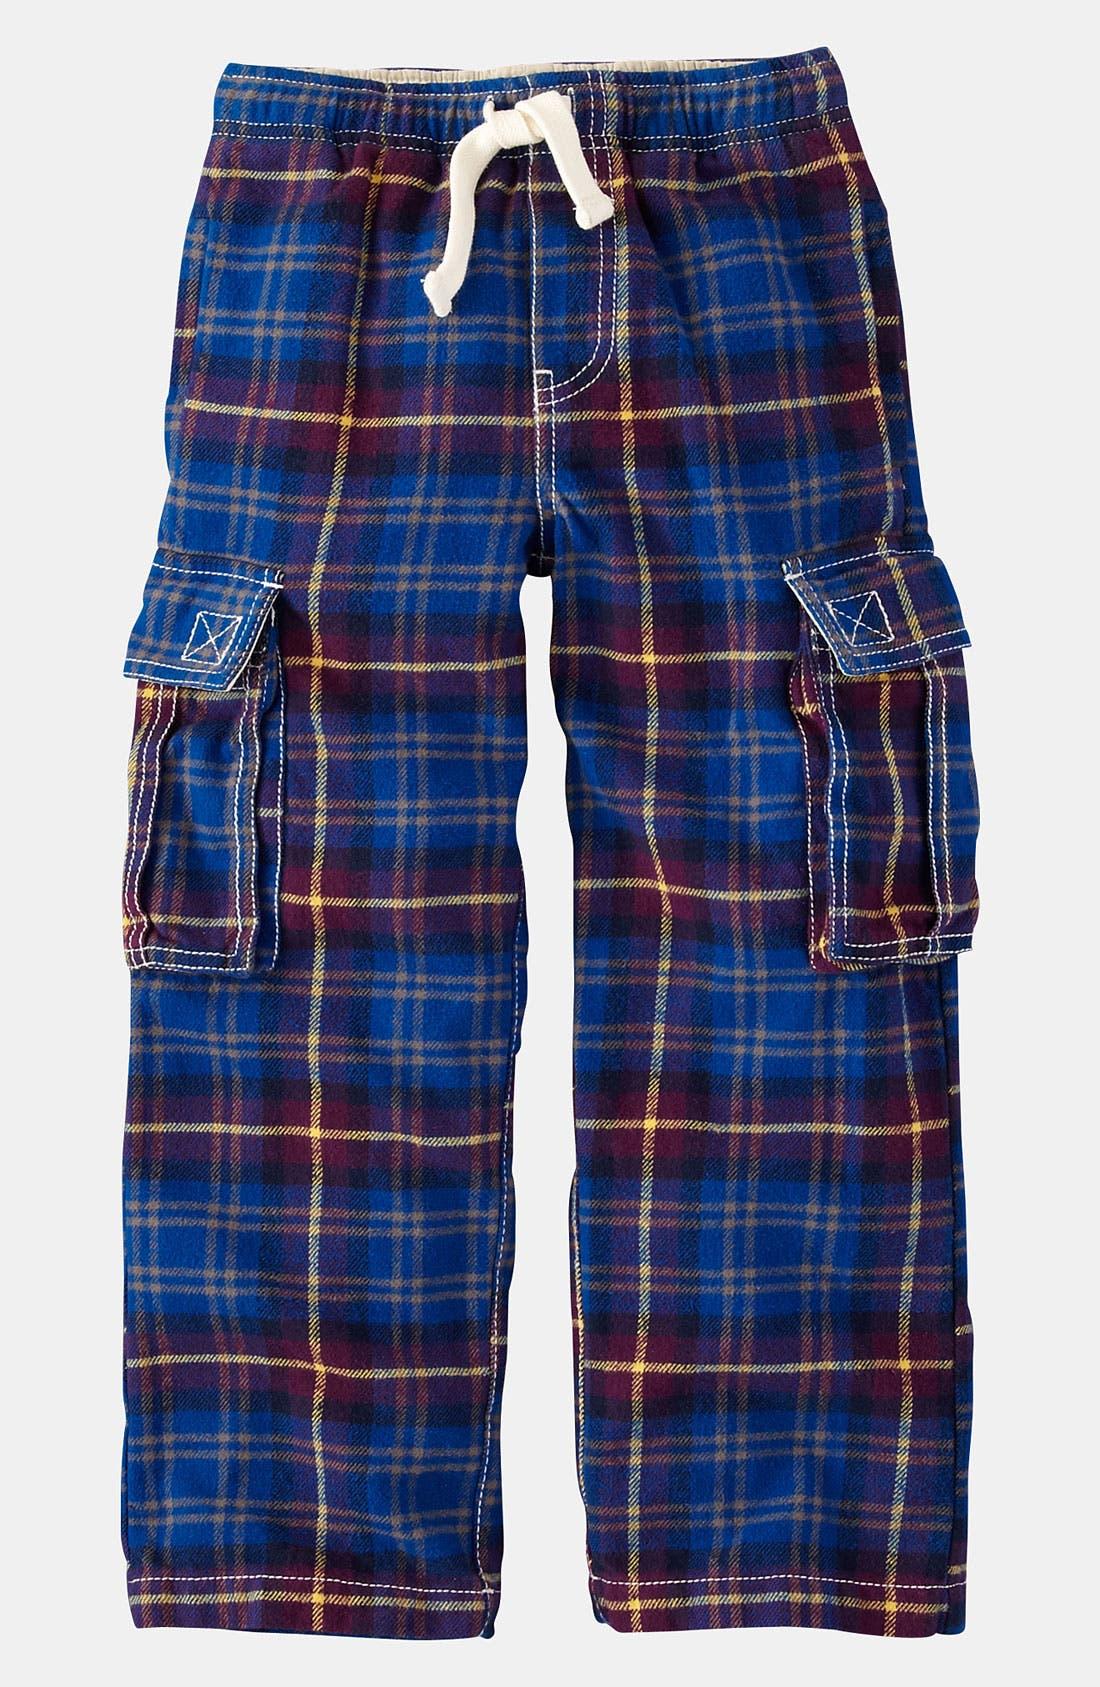 Alternate Image 1 Selected - Mini Boden Brushed Tartan Cargo Pants (Toddler)